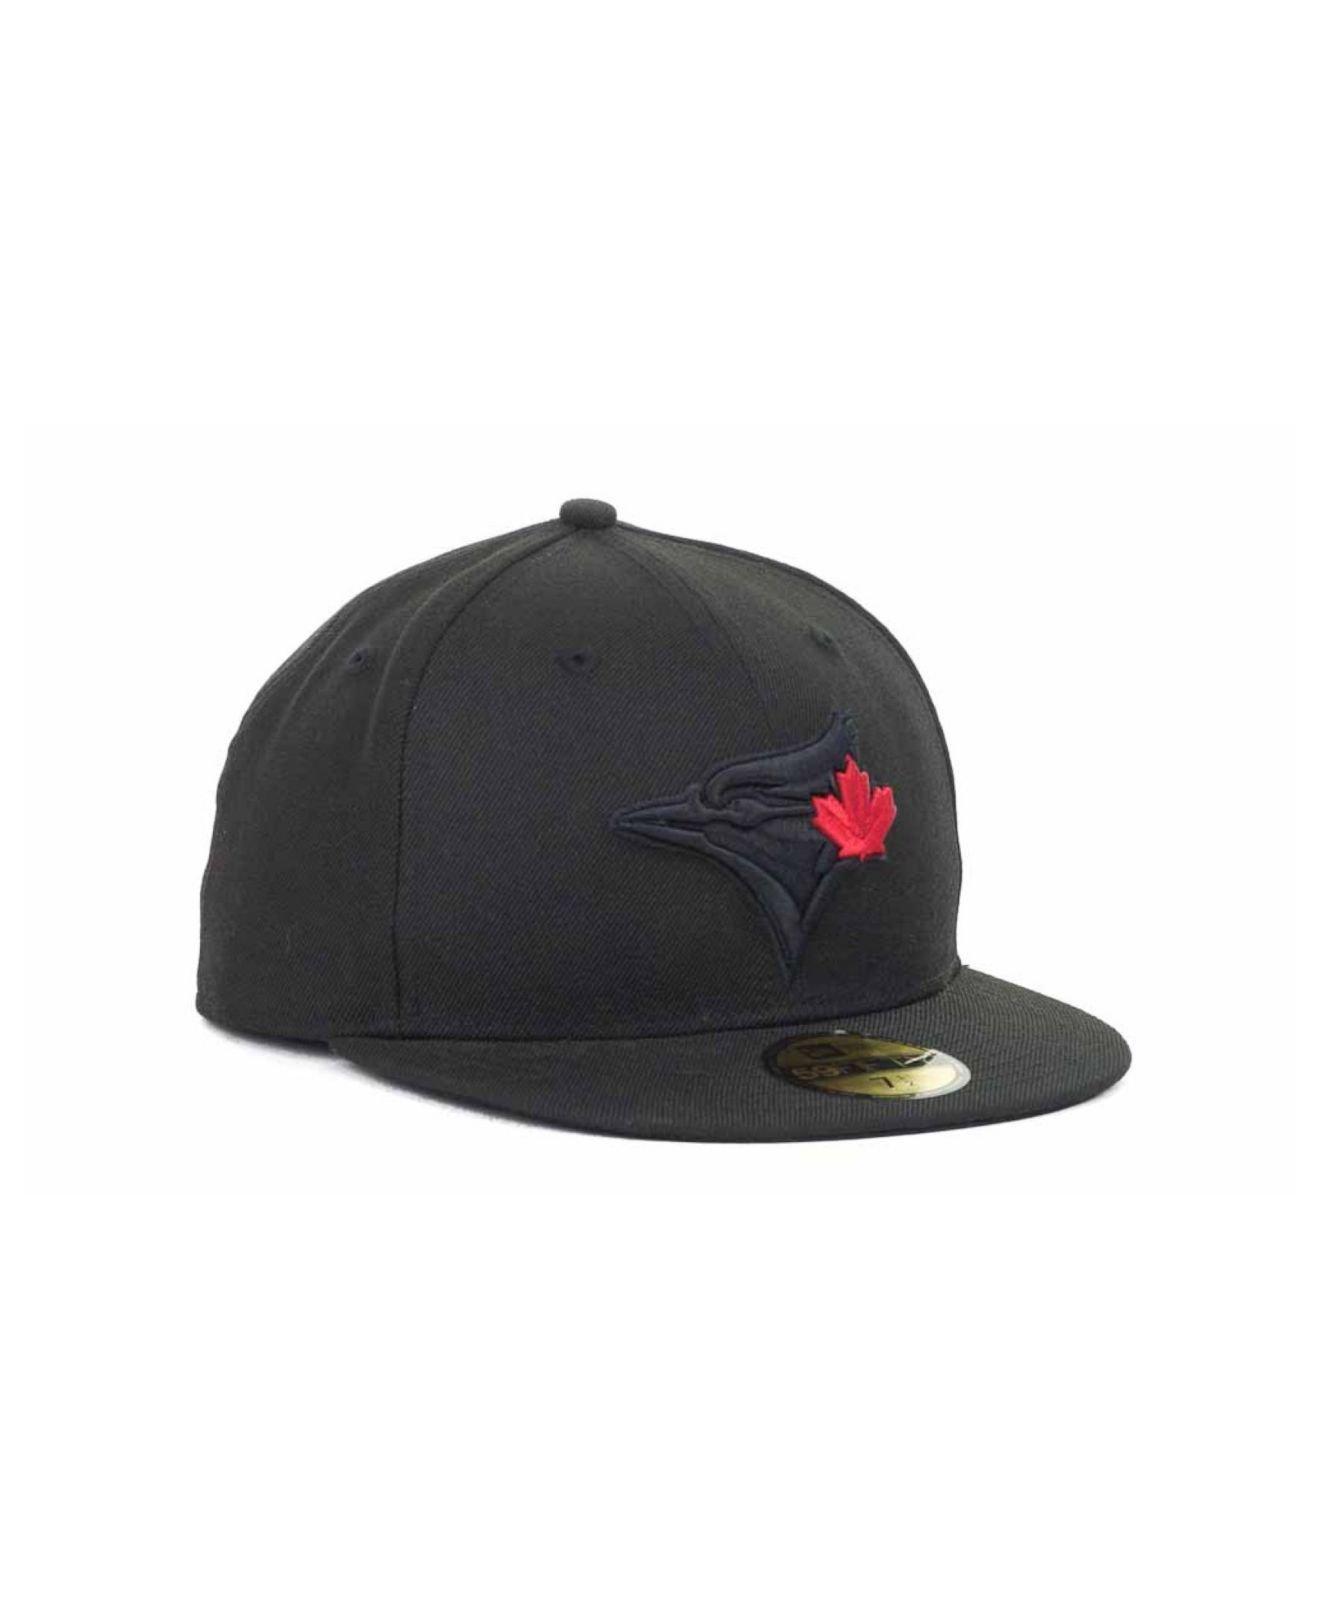 best service efd89 c748b ... official store lyst ktz toronto blue jays mlb black on black fashion 59fifty  cap fc24b 07d09